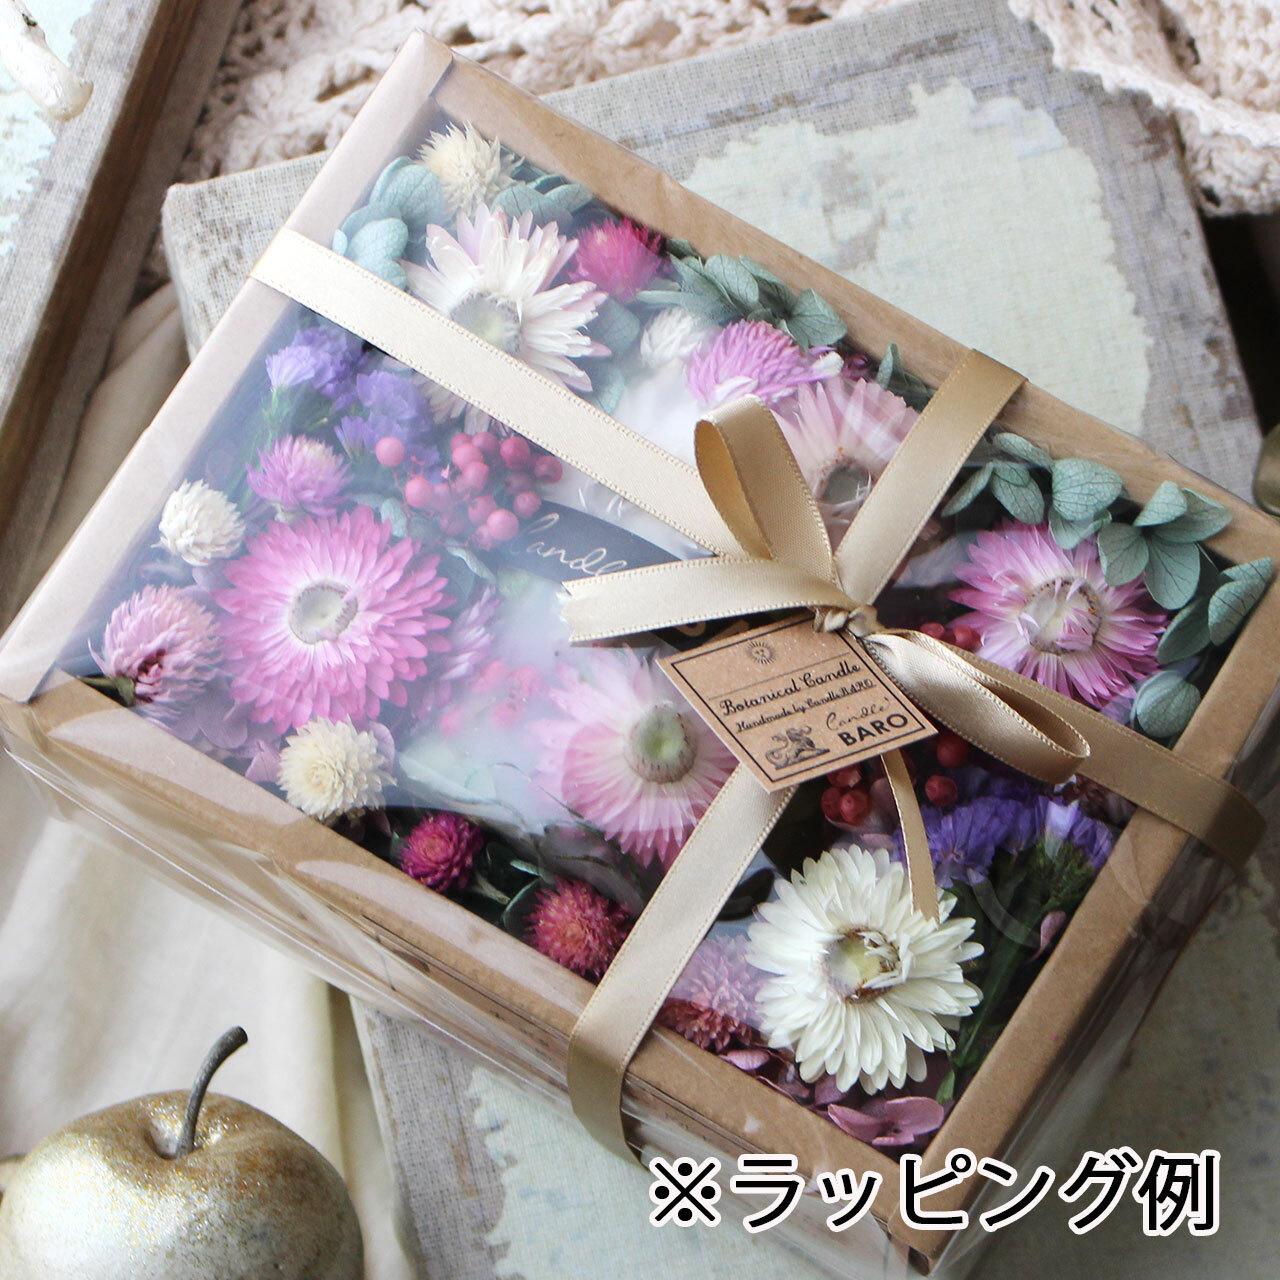 H489 透明ラッピング&紙袋付き☆ボタニカルキャンドルギフト ラナンキュラス